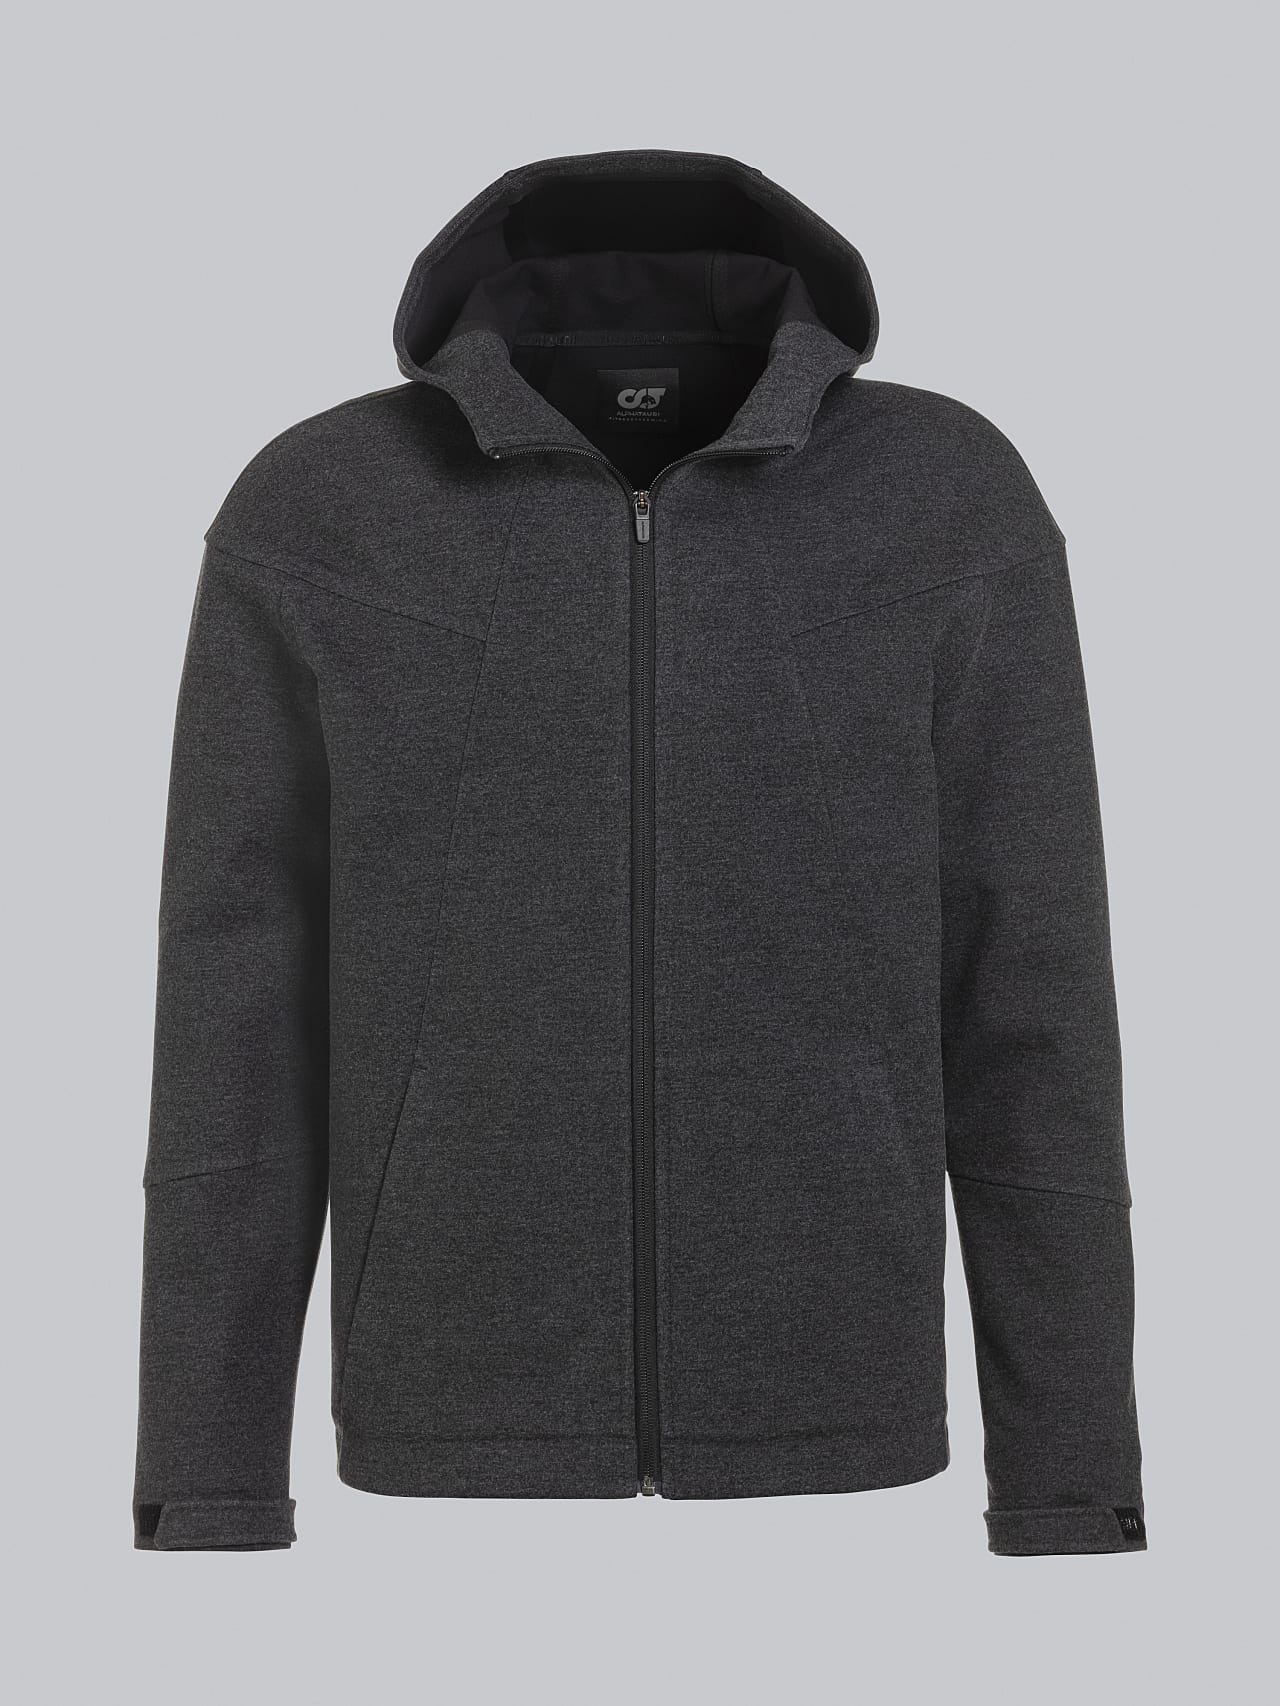 SROTE V1.Y5.02 Waterproof Sweatjacket dark grey / anthracite Back Alpha Tauri